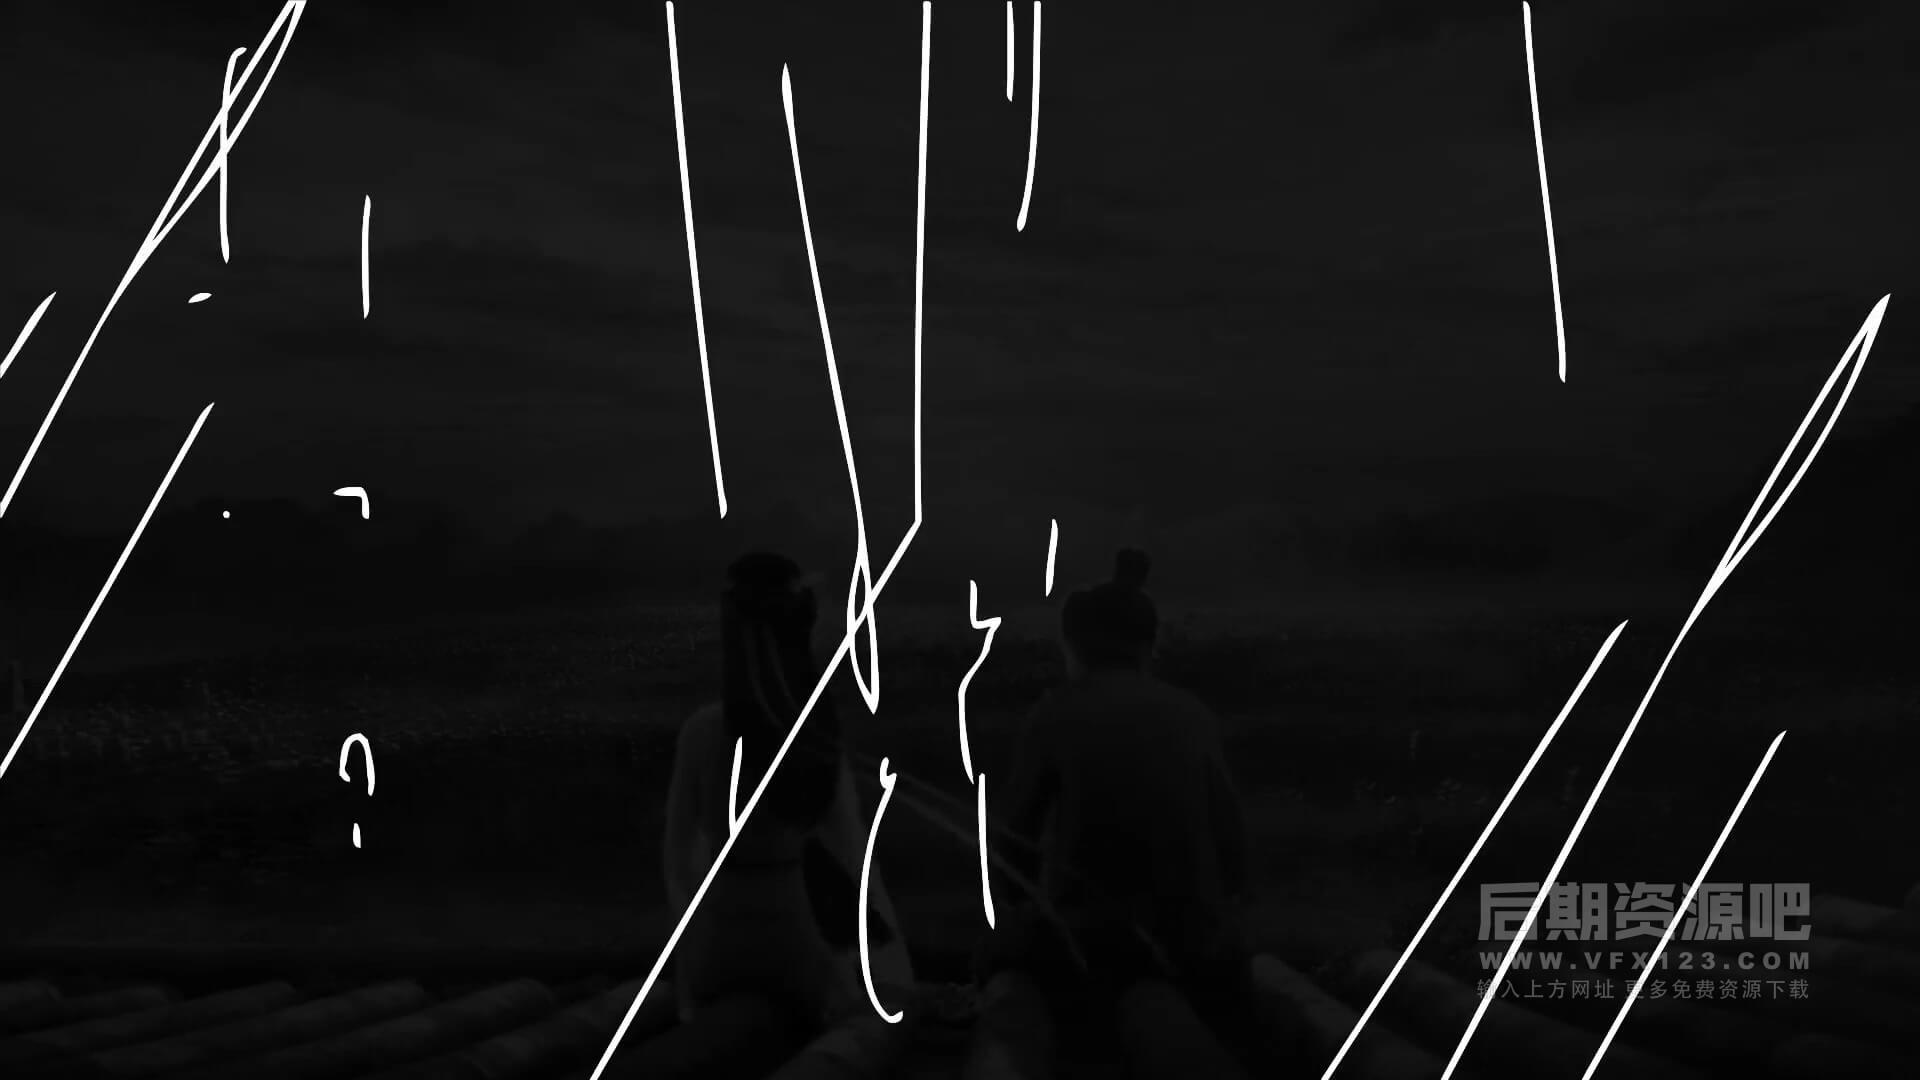 Fcpx插件 2D彩色发散线条背景制作工具 Speed Backgrounds